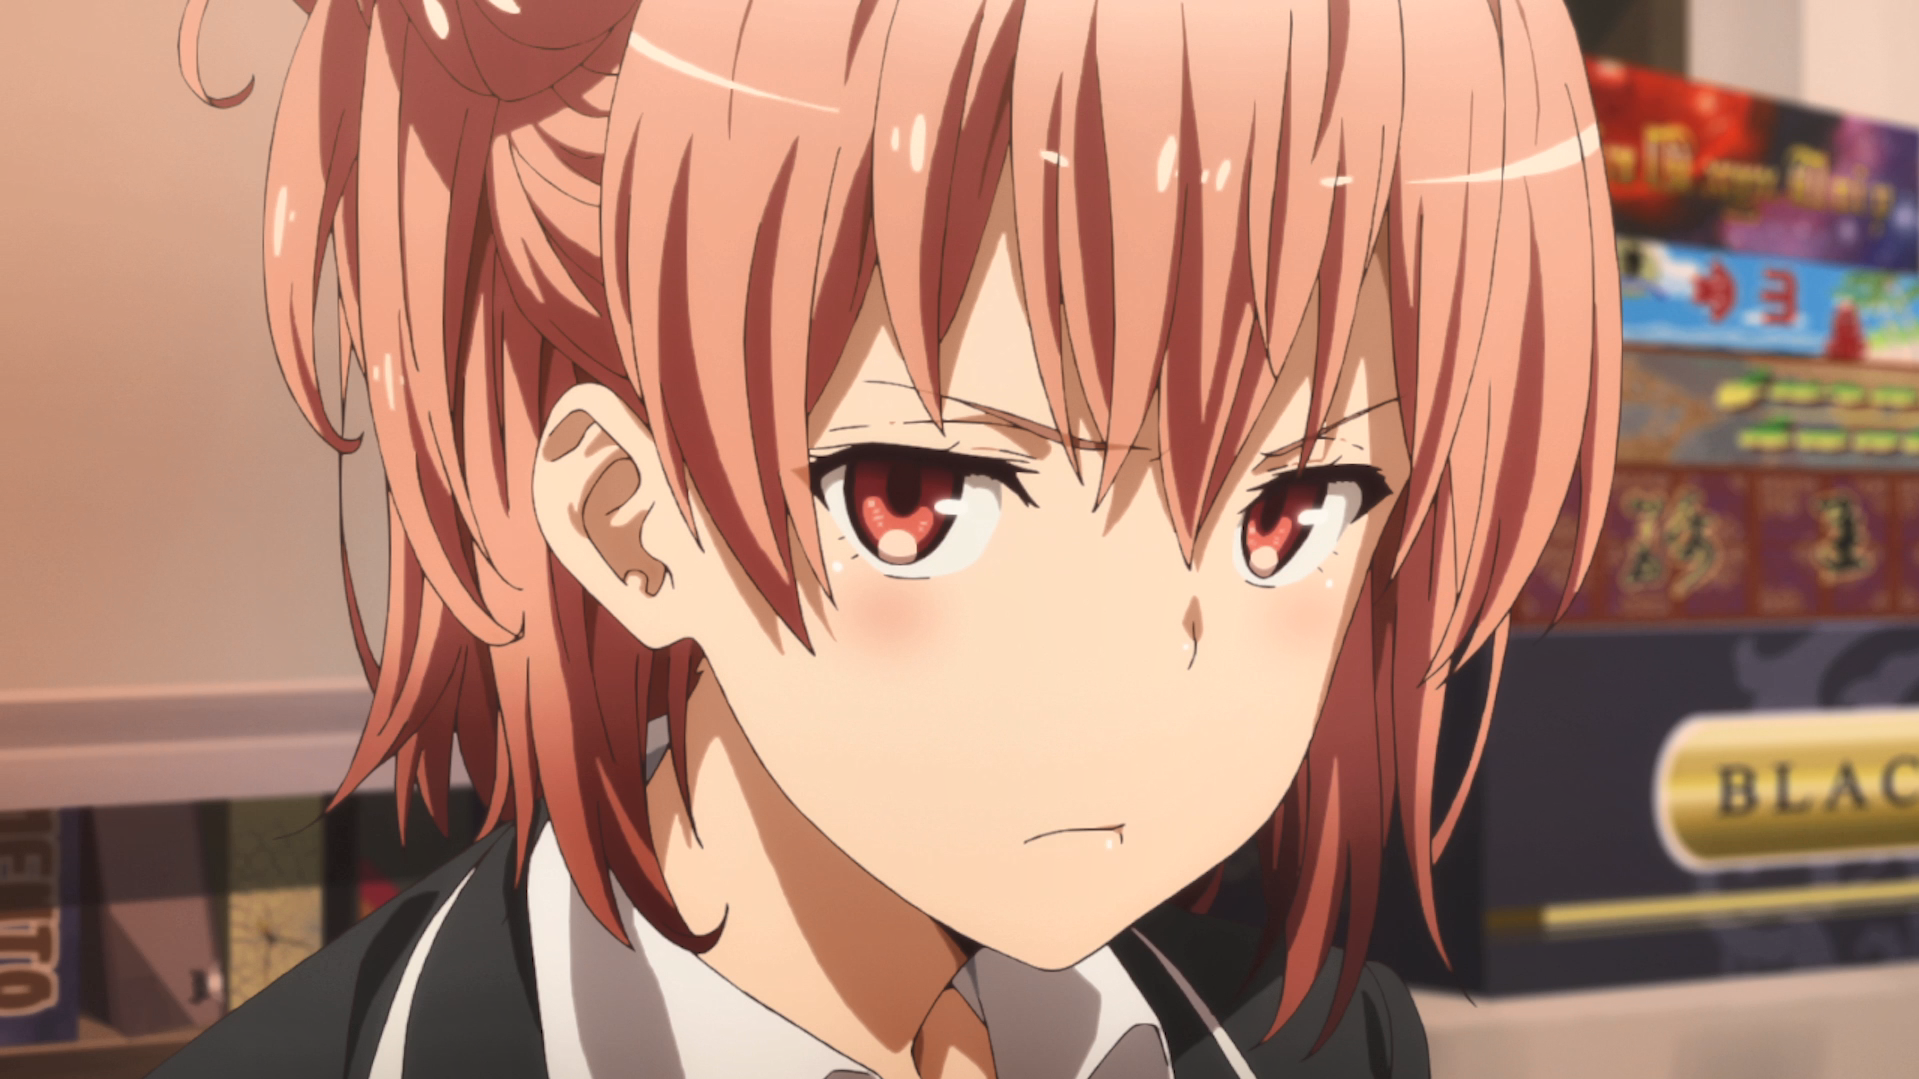 oregairu yui angry